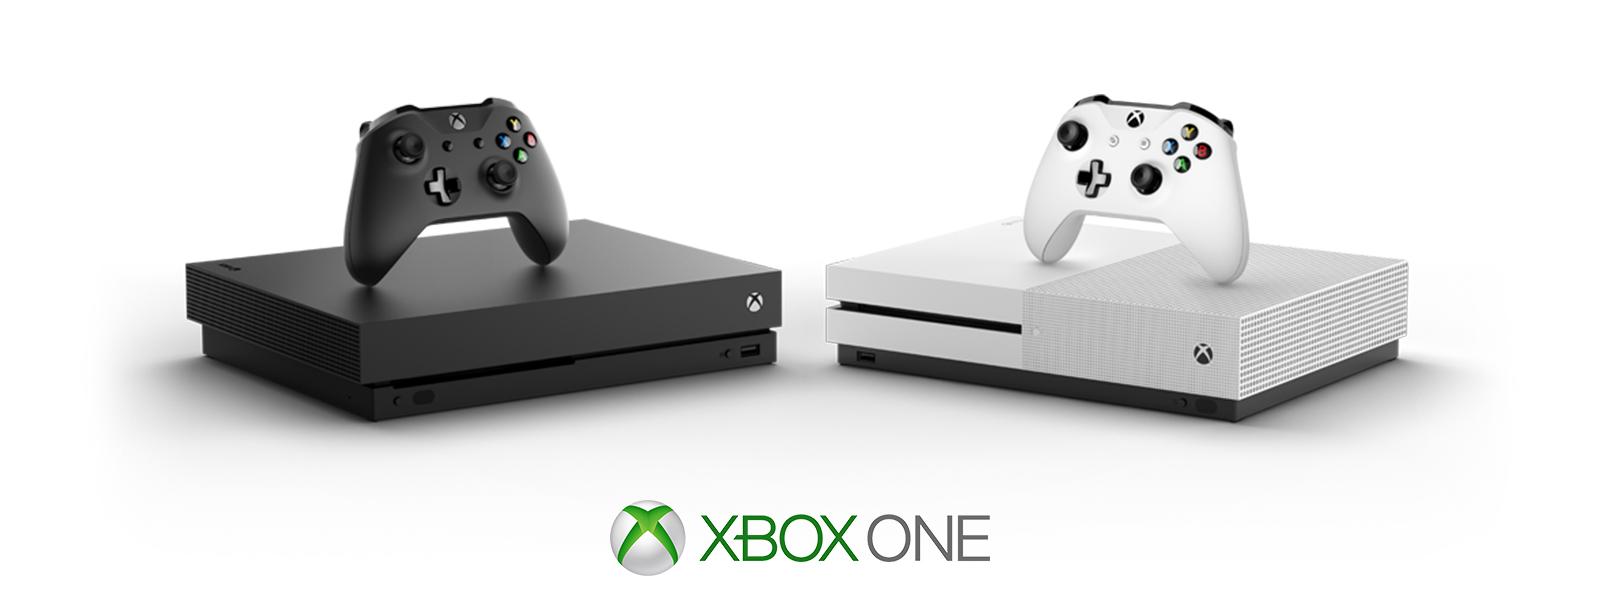 Xbox One X 및 Xbox One S